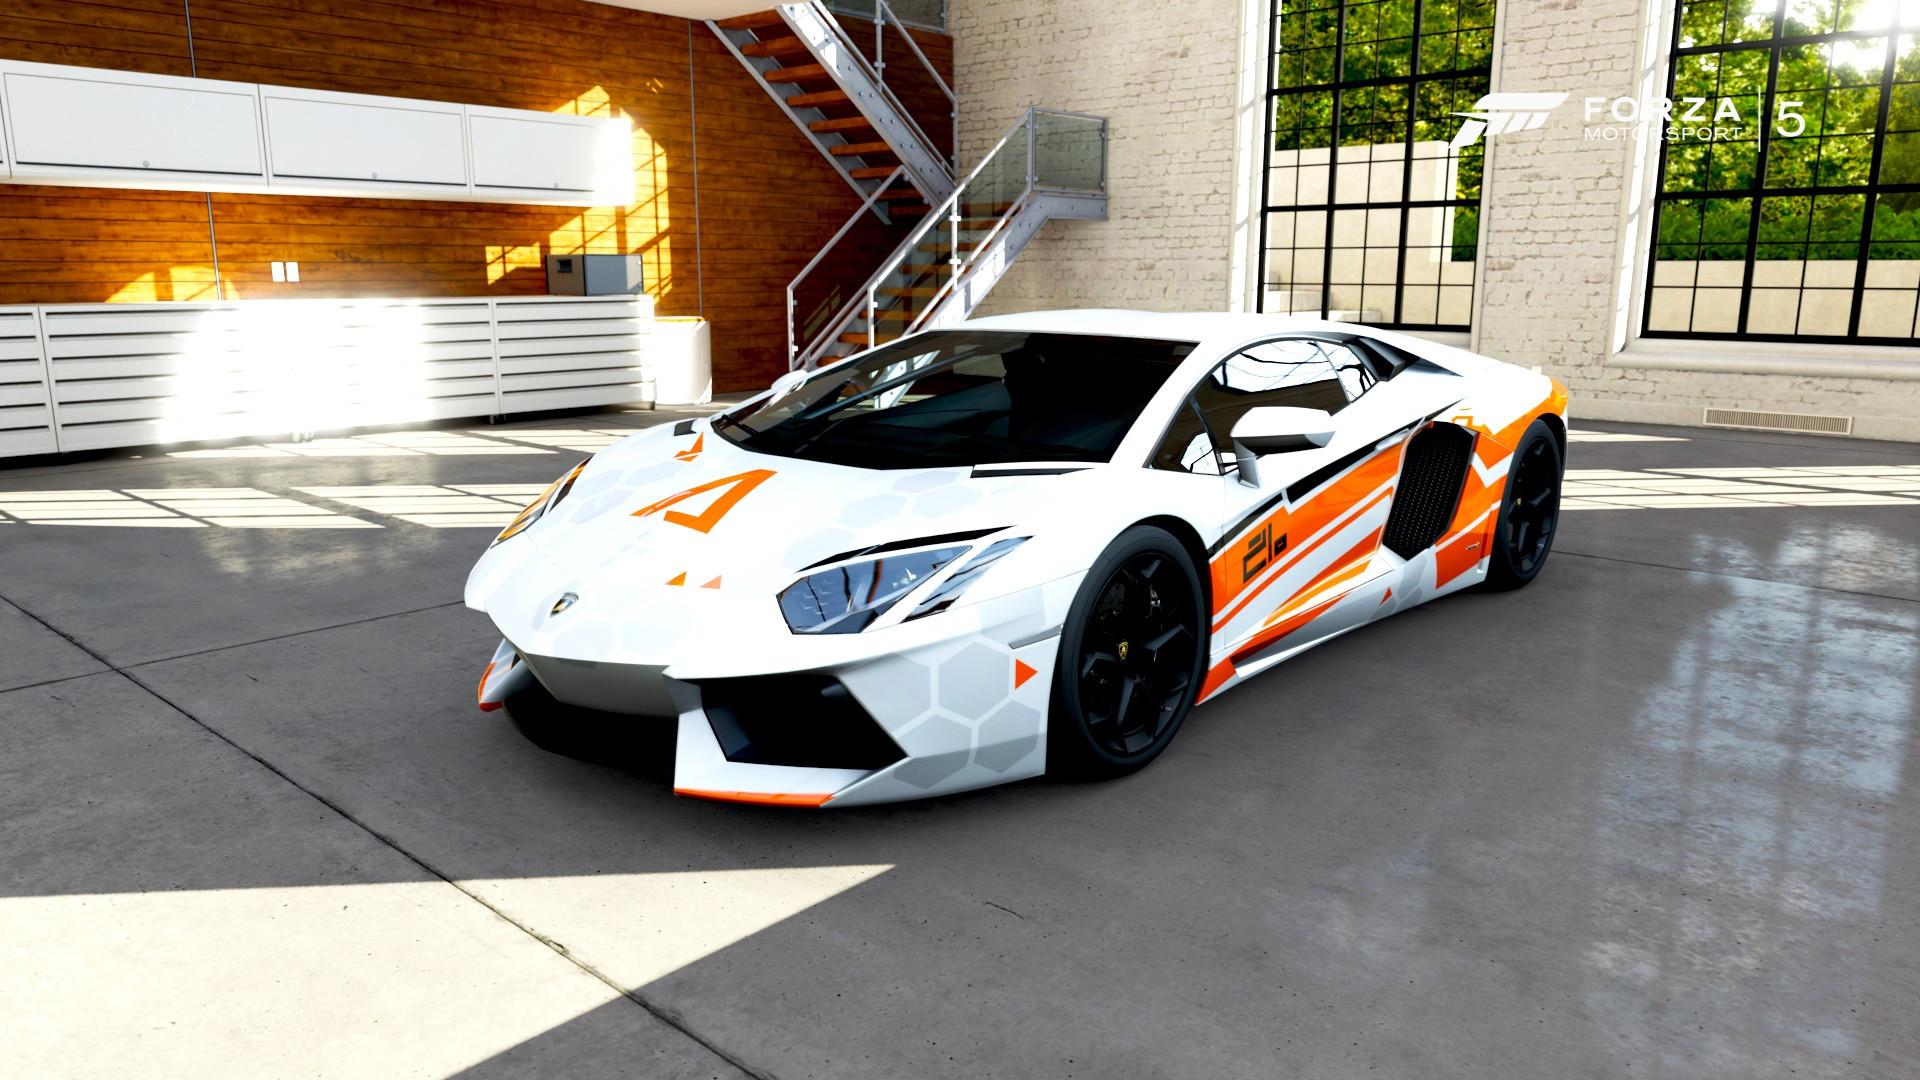 Stunning TitanFall Aventador Made in Forza Motorsport 5